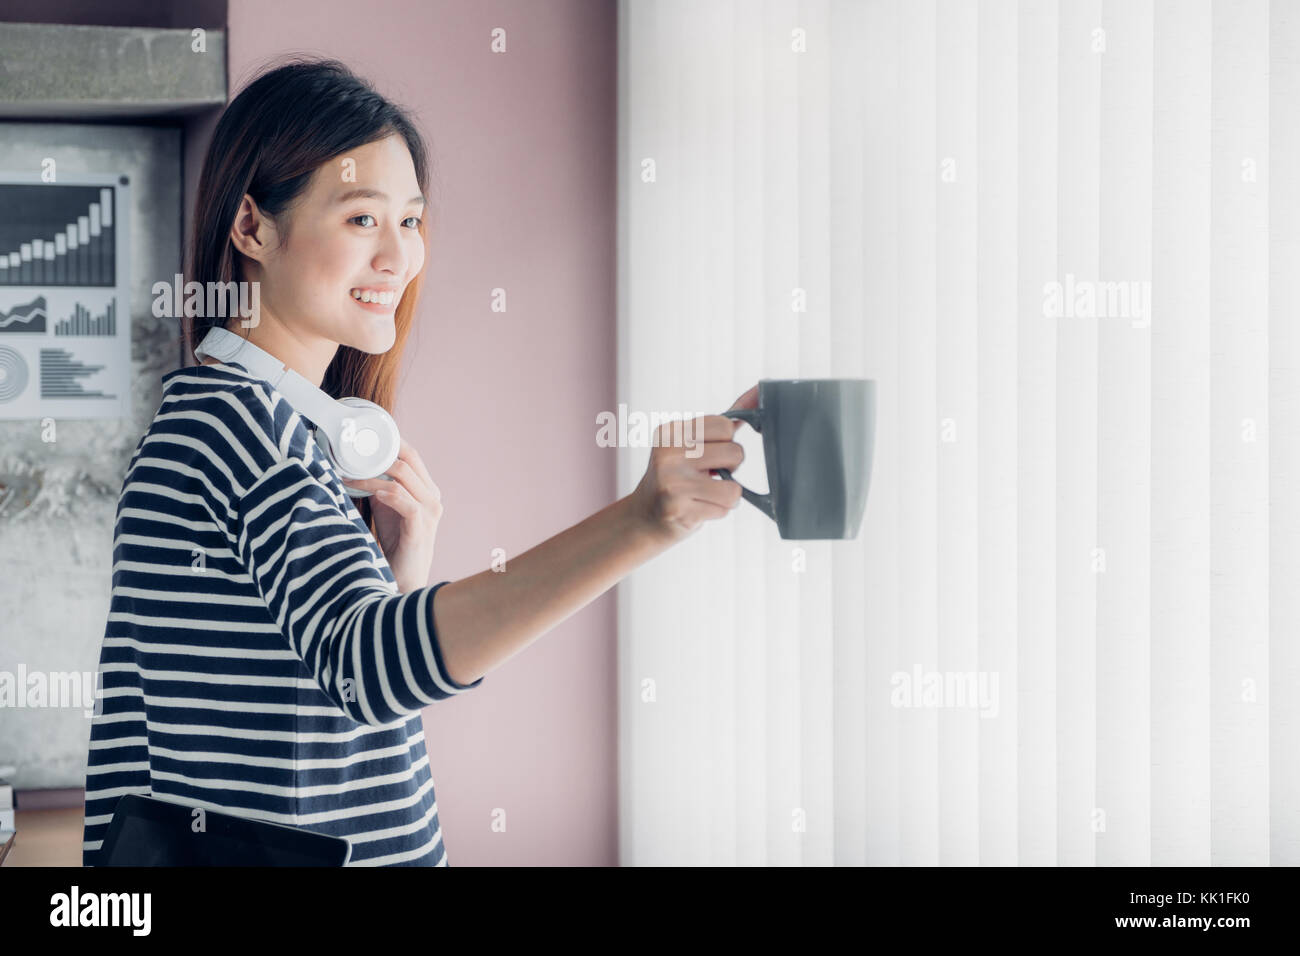 Take Break Coffeebreak : Asian businesswoman take a coffee break after working with smiling